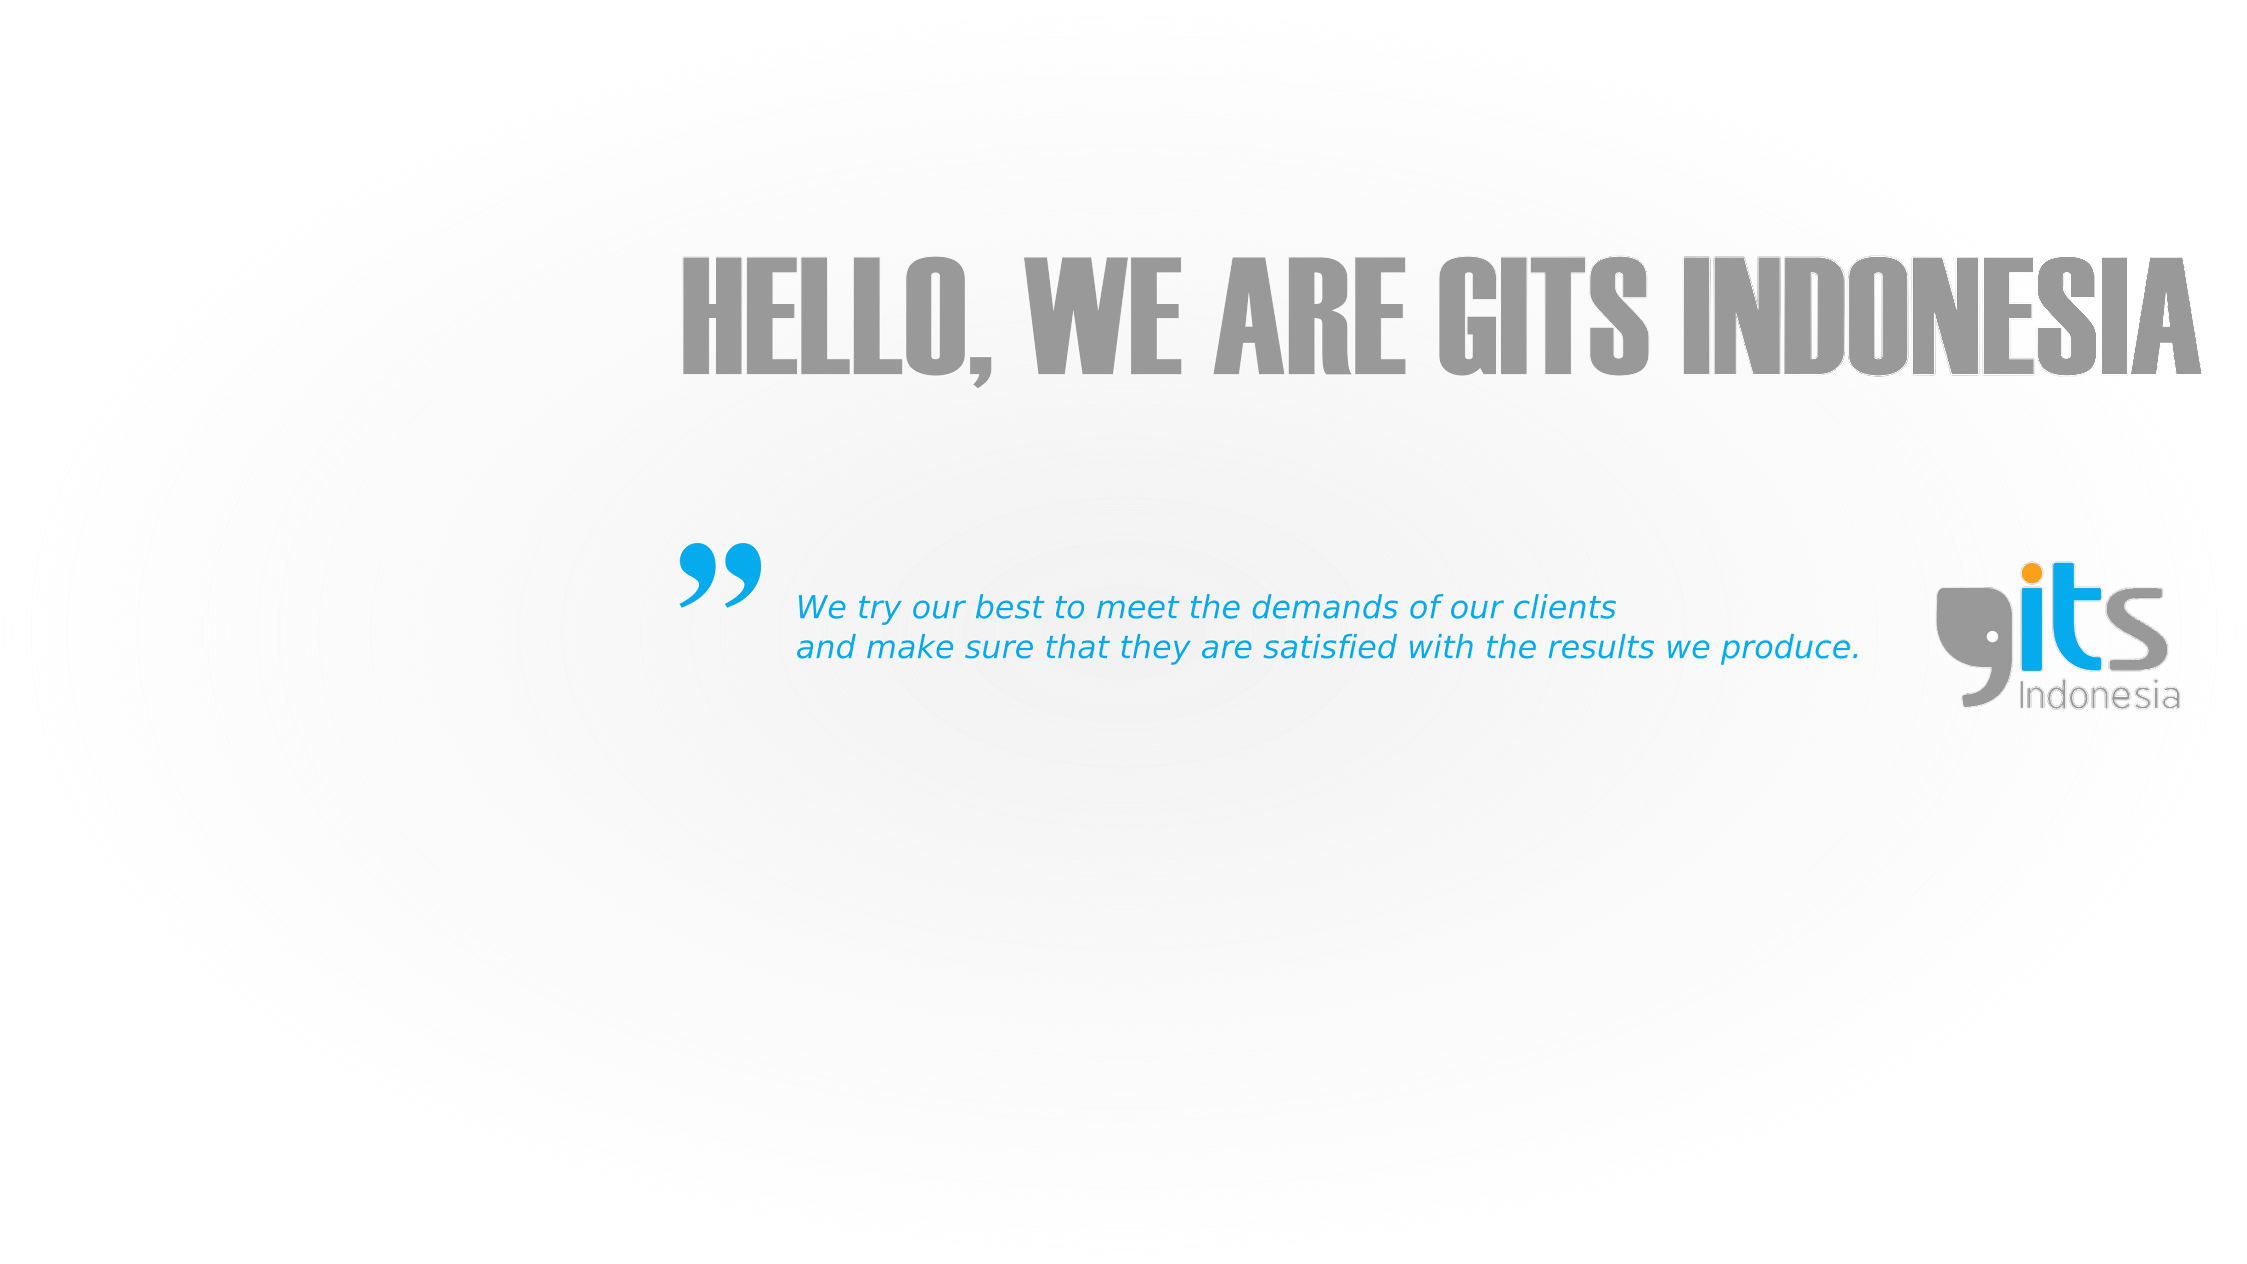 GITS Indonesia